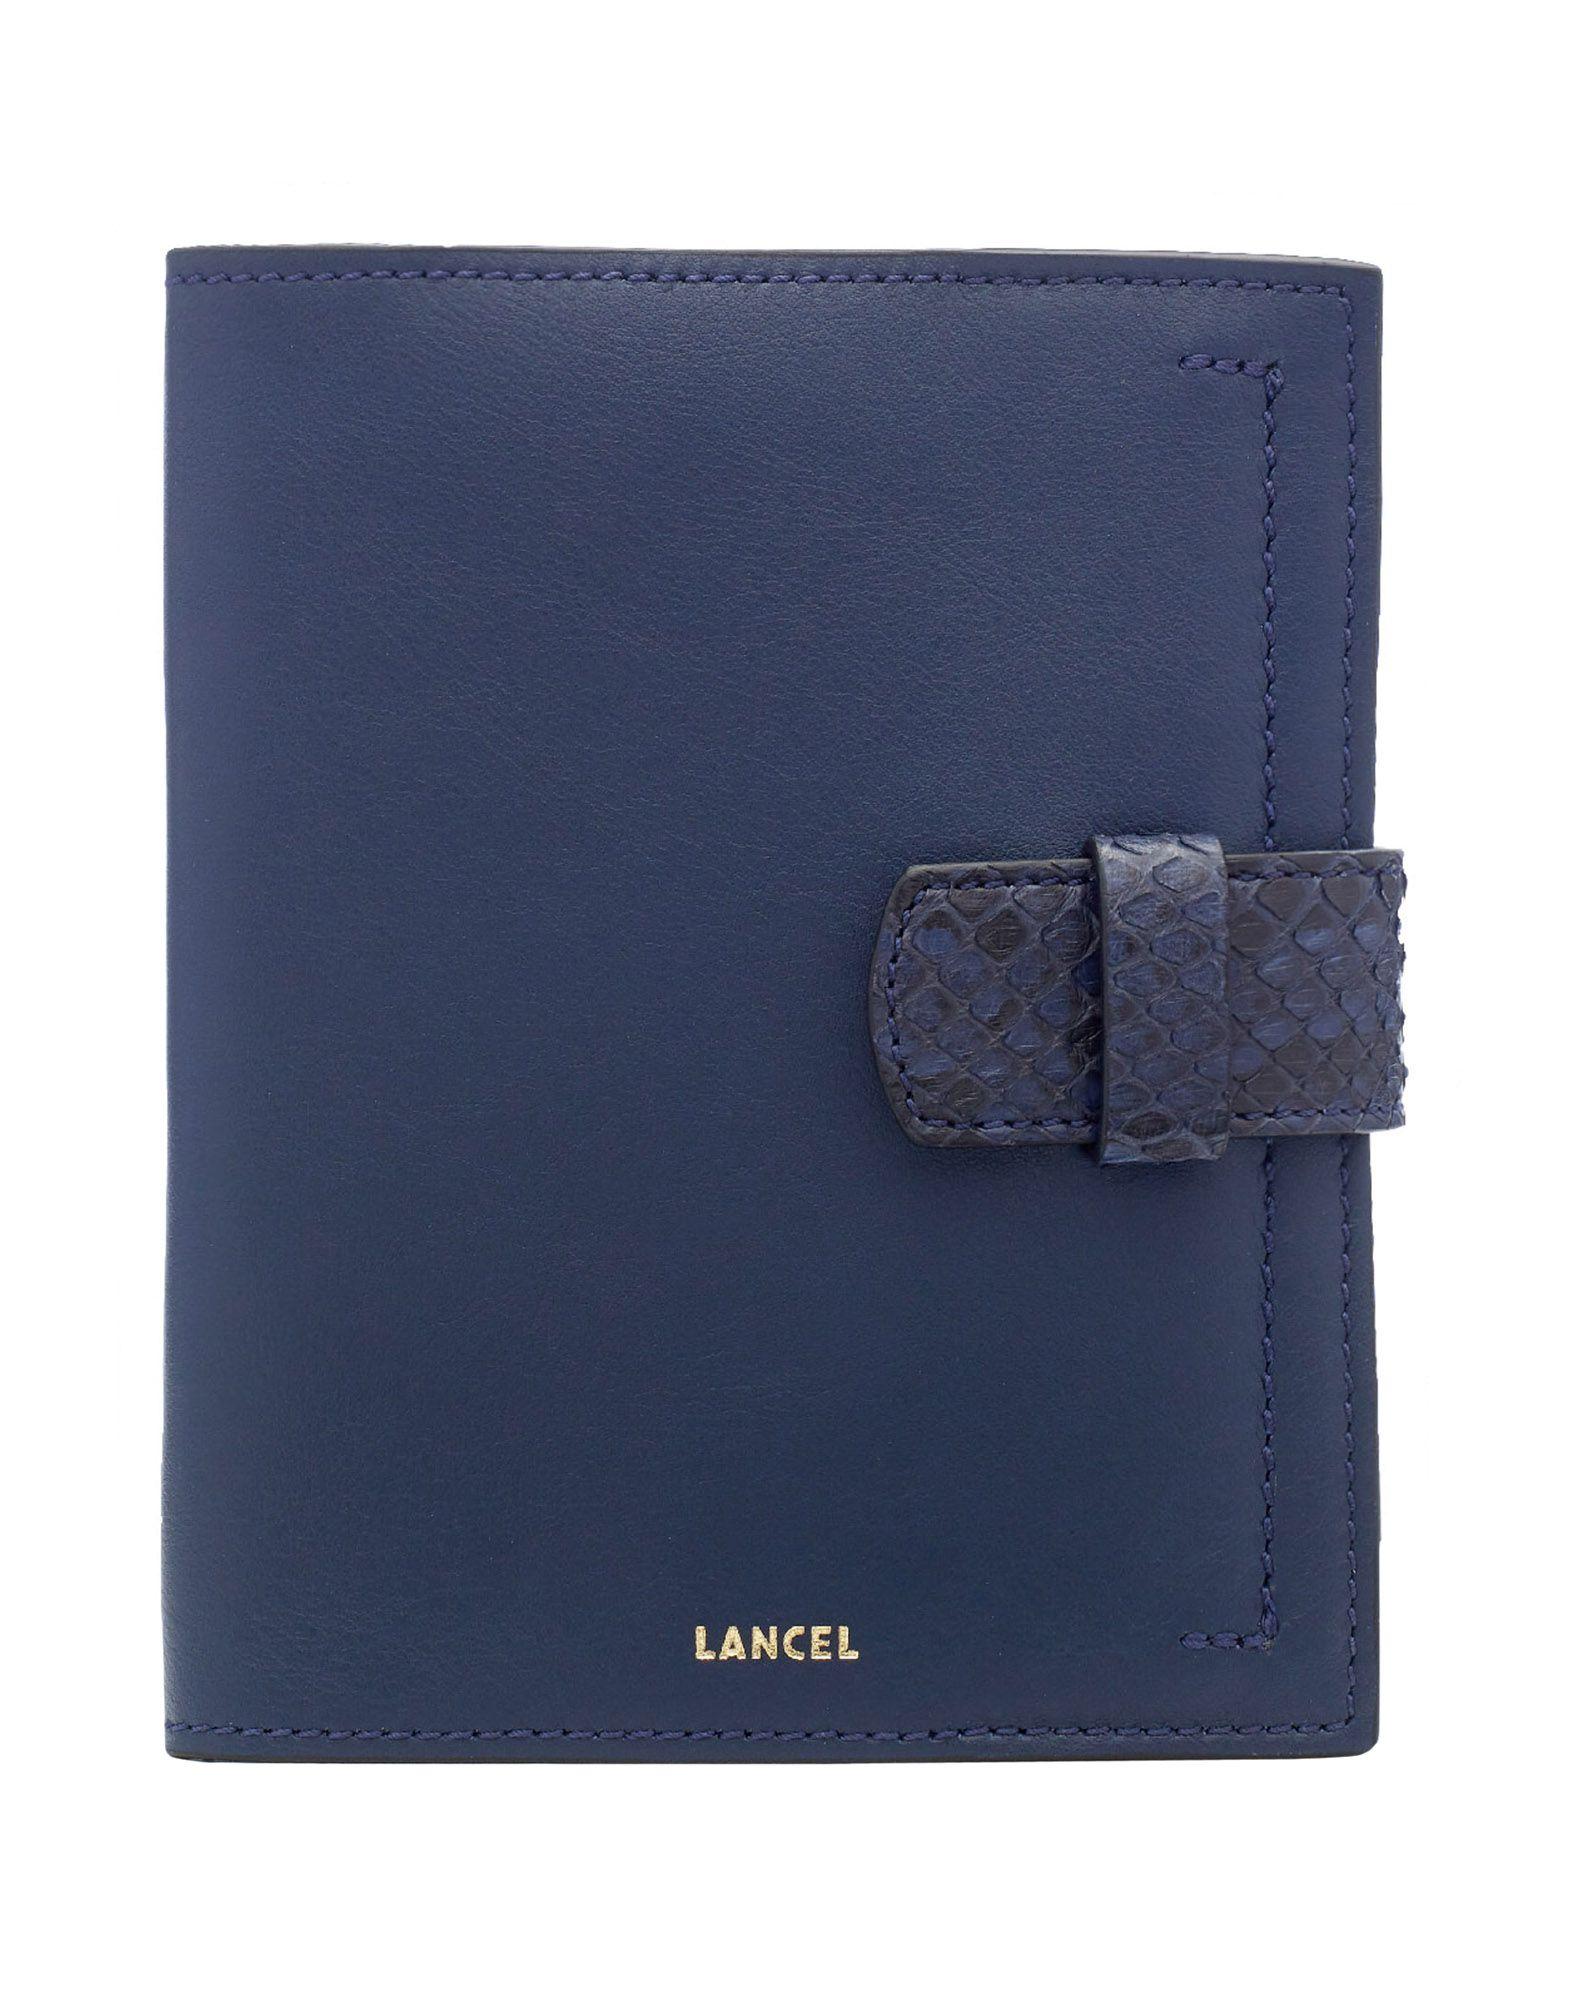 Portadocumenti Lancel Jules Python/Cuir Lisse - Uomo - Acquista online su